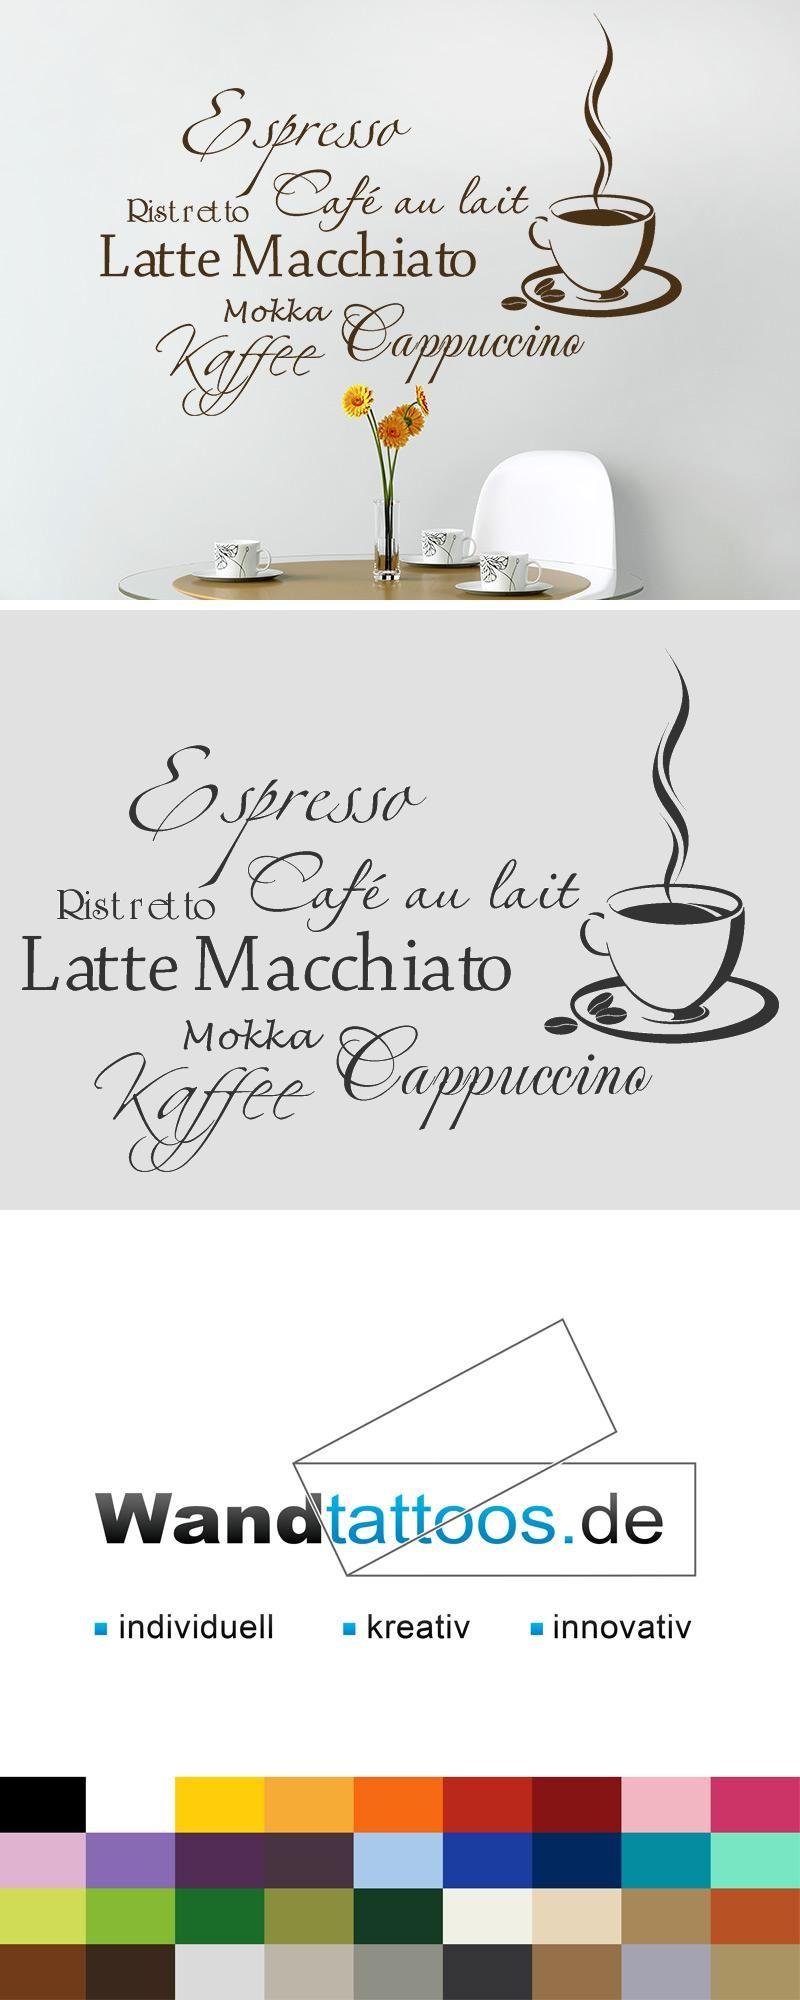 Wandtattoo Kaffee Aroma mit Kaffeetasse | Küche Wandtattoo ...